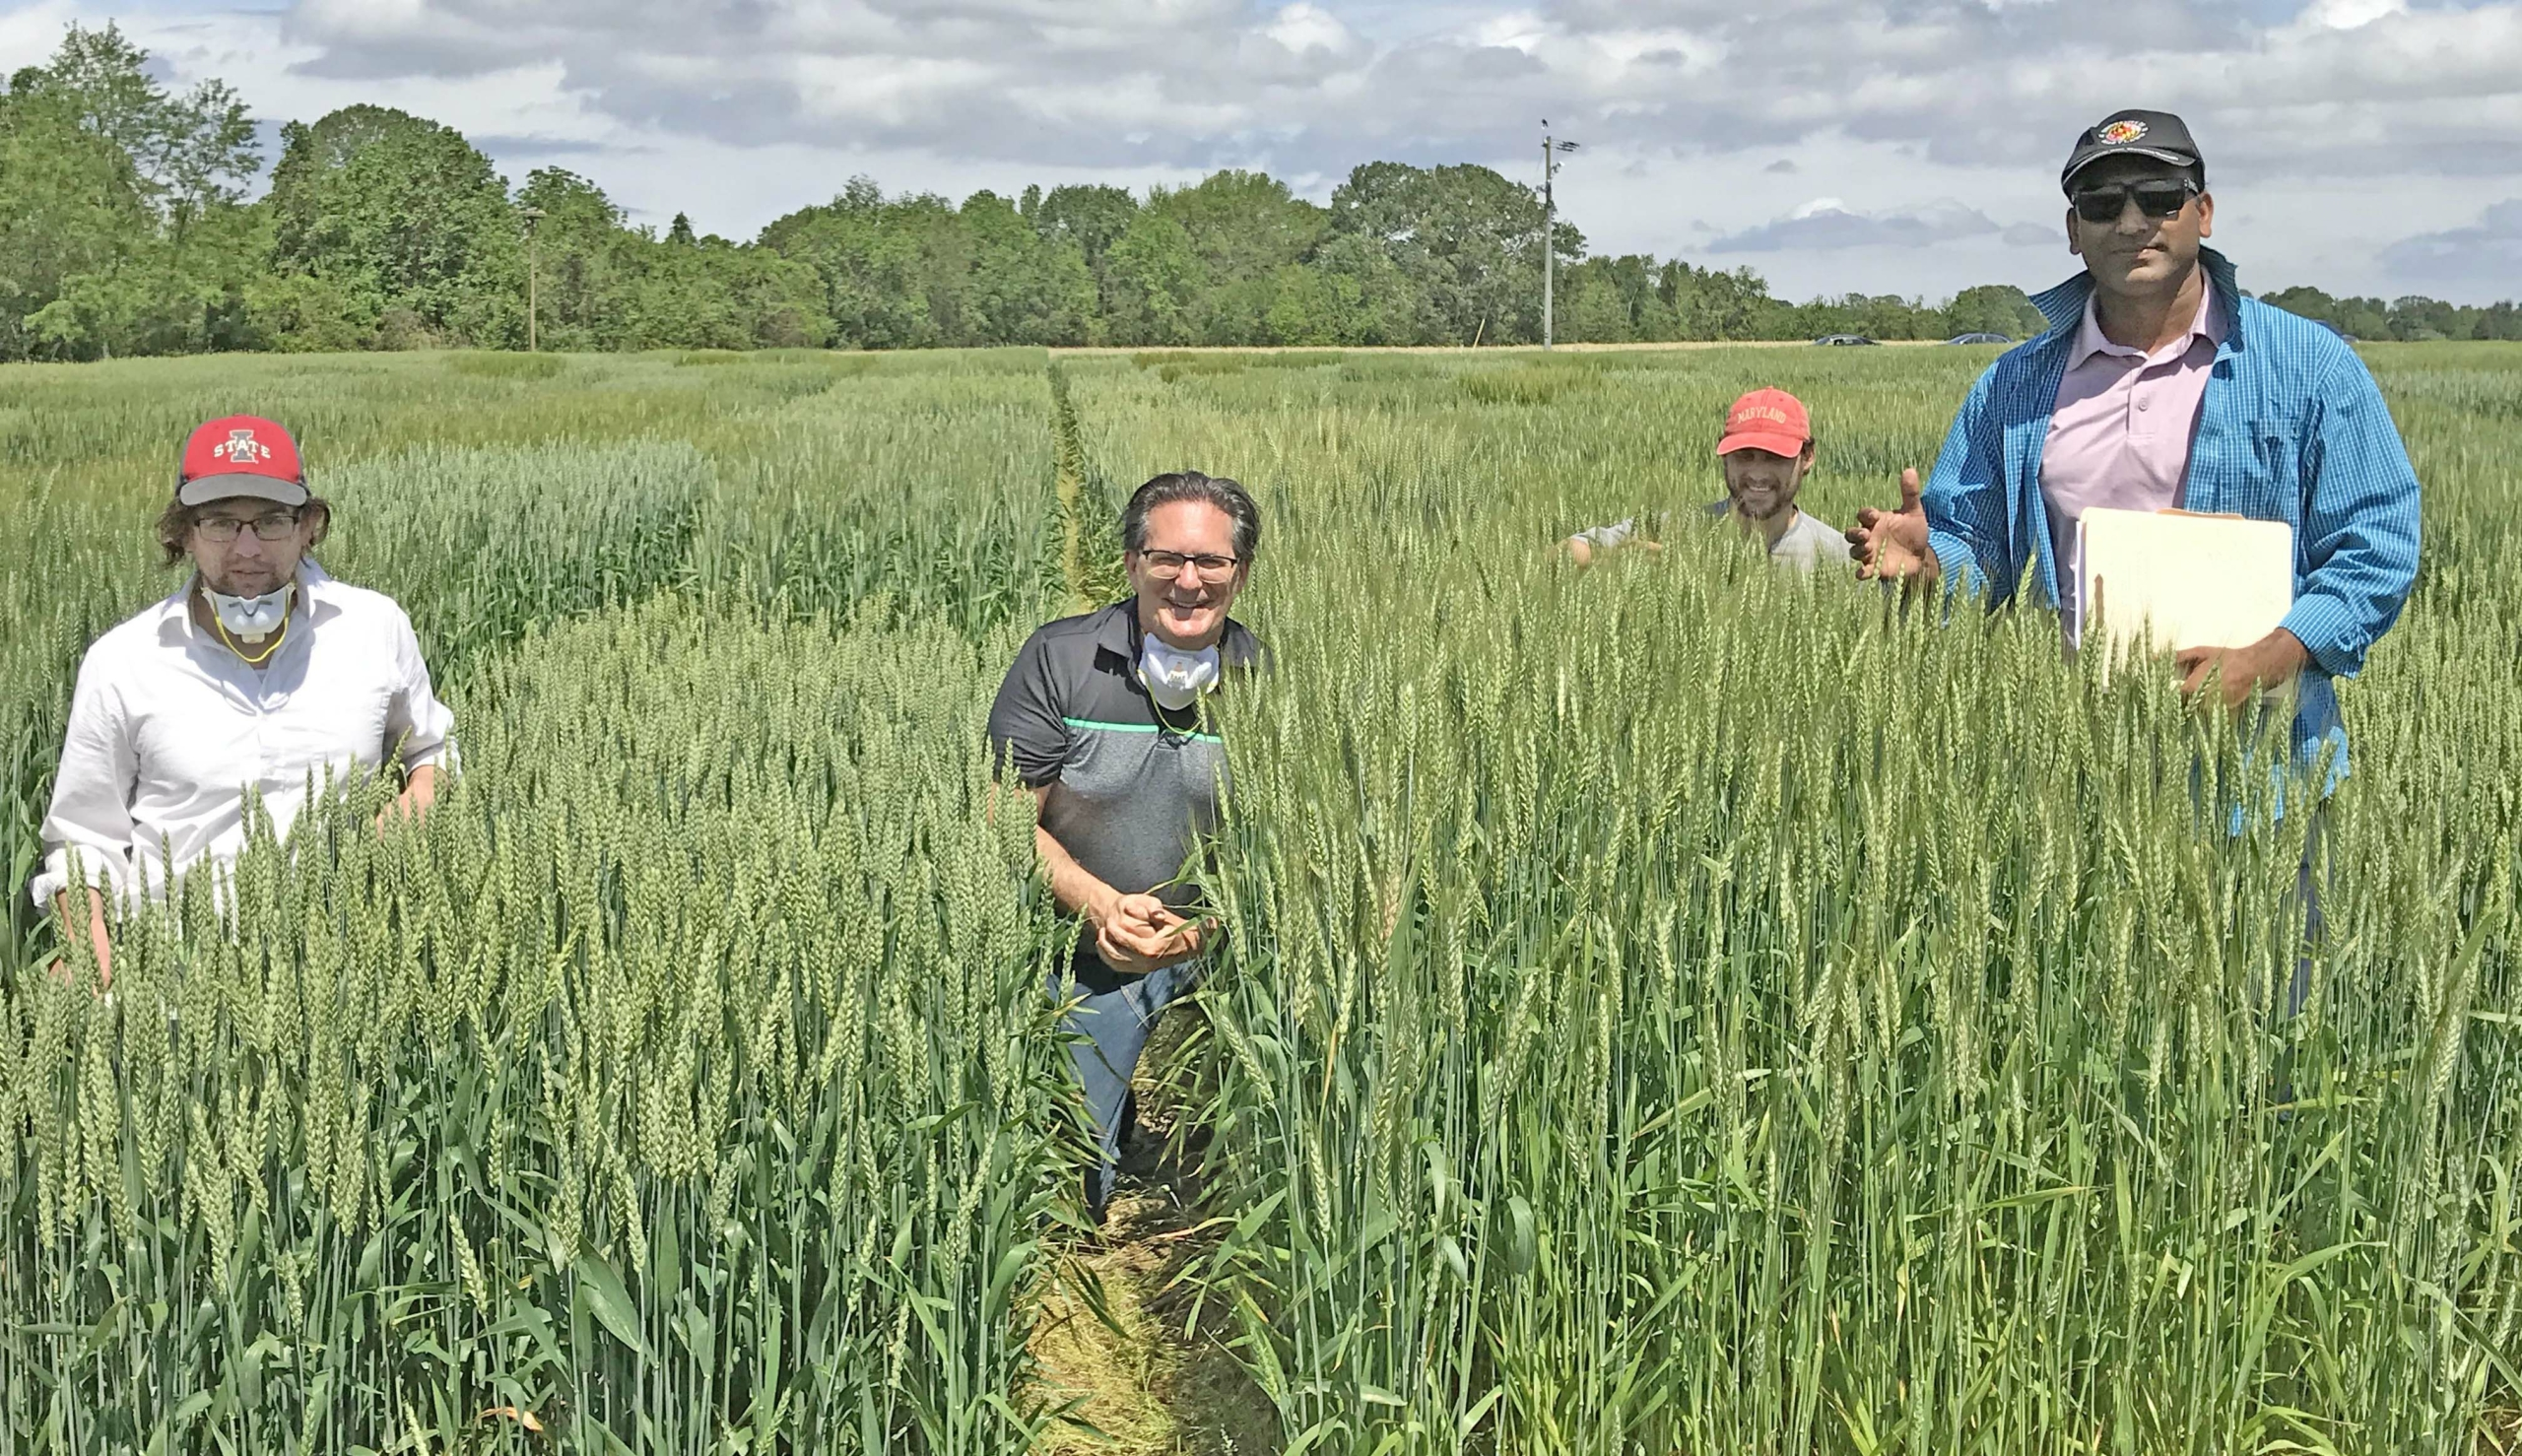 Maryland's public wheat breeding program